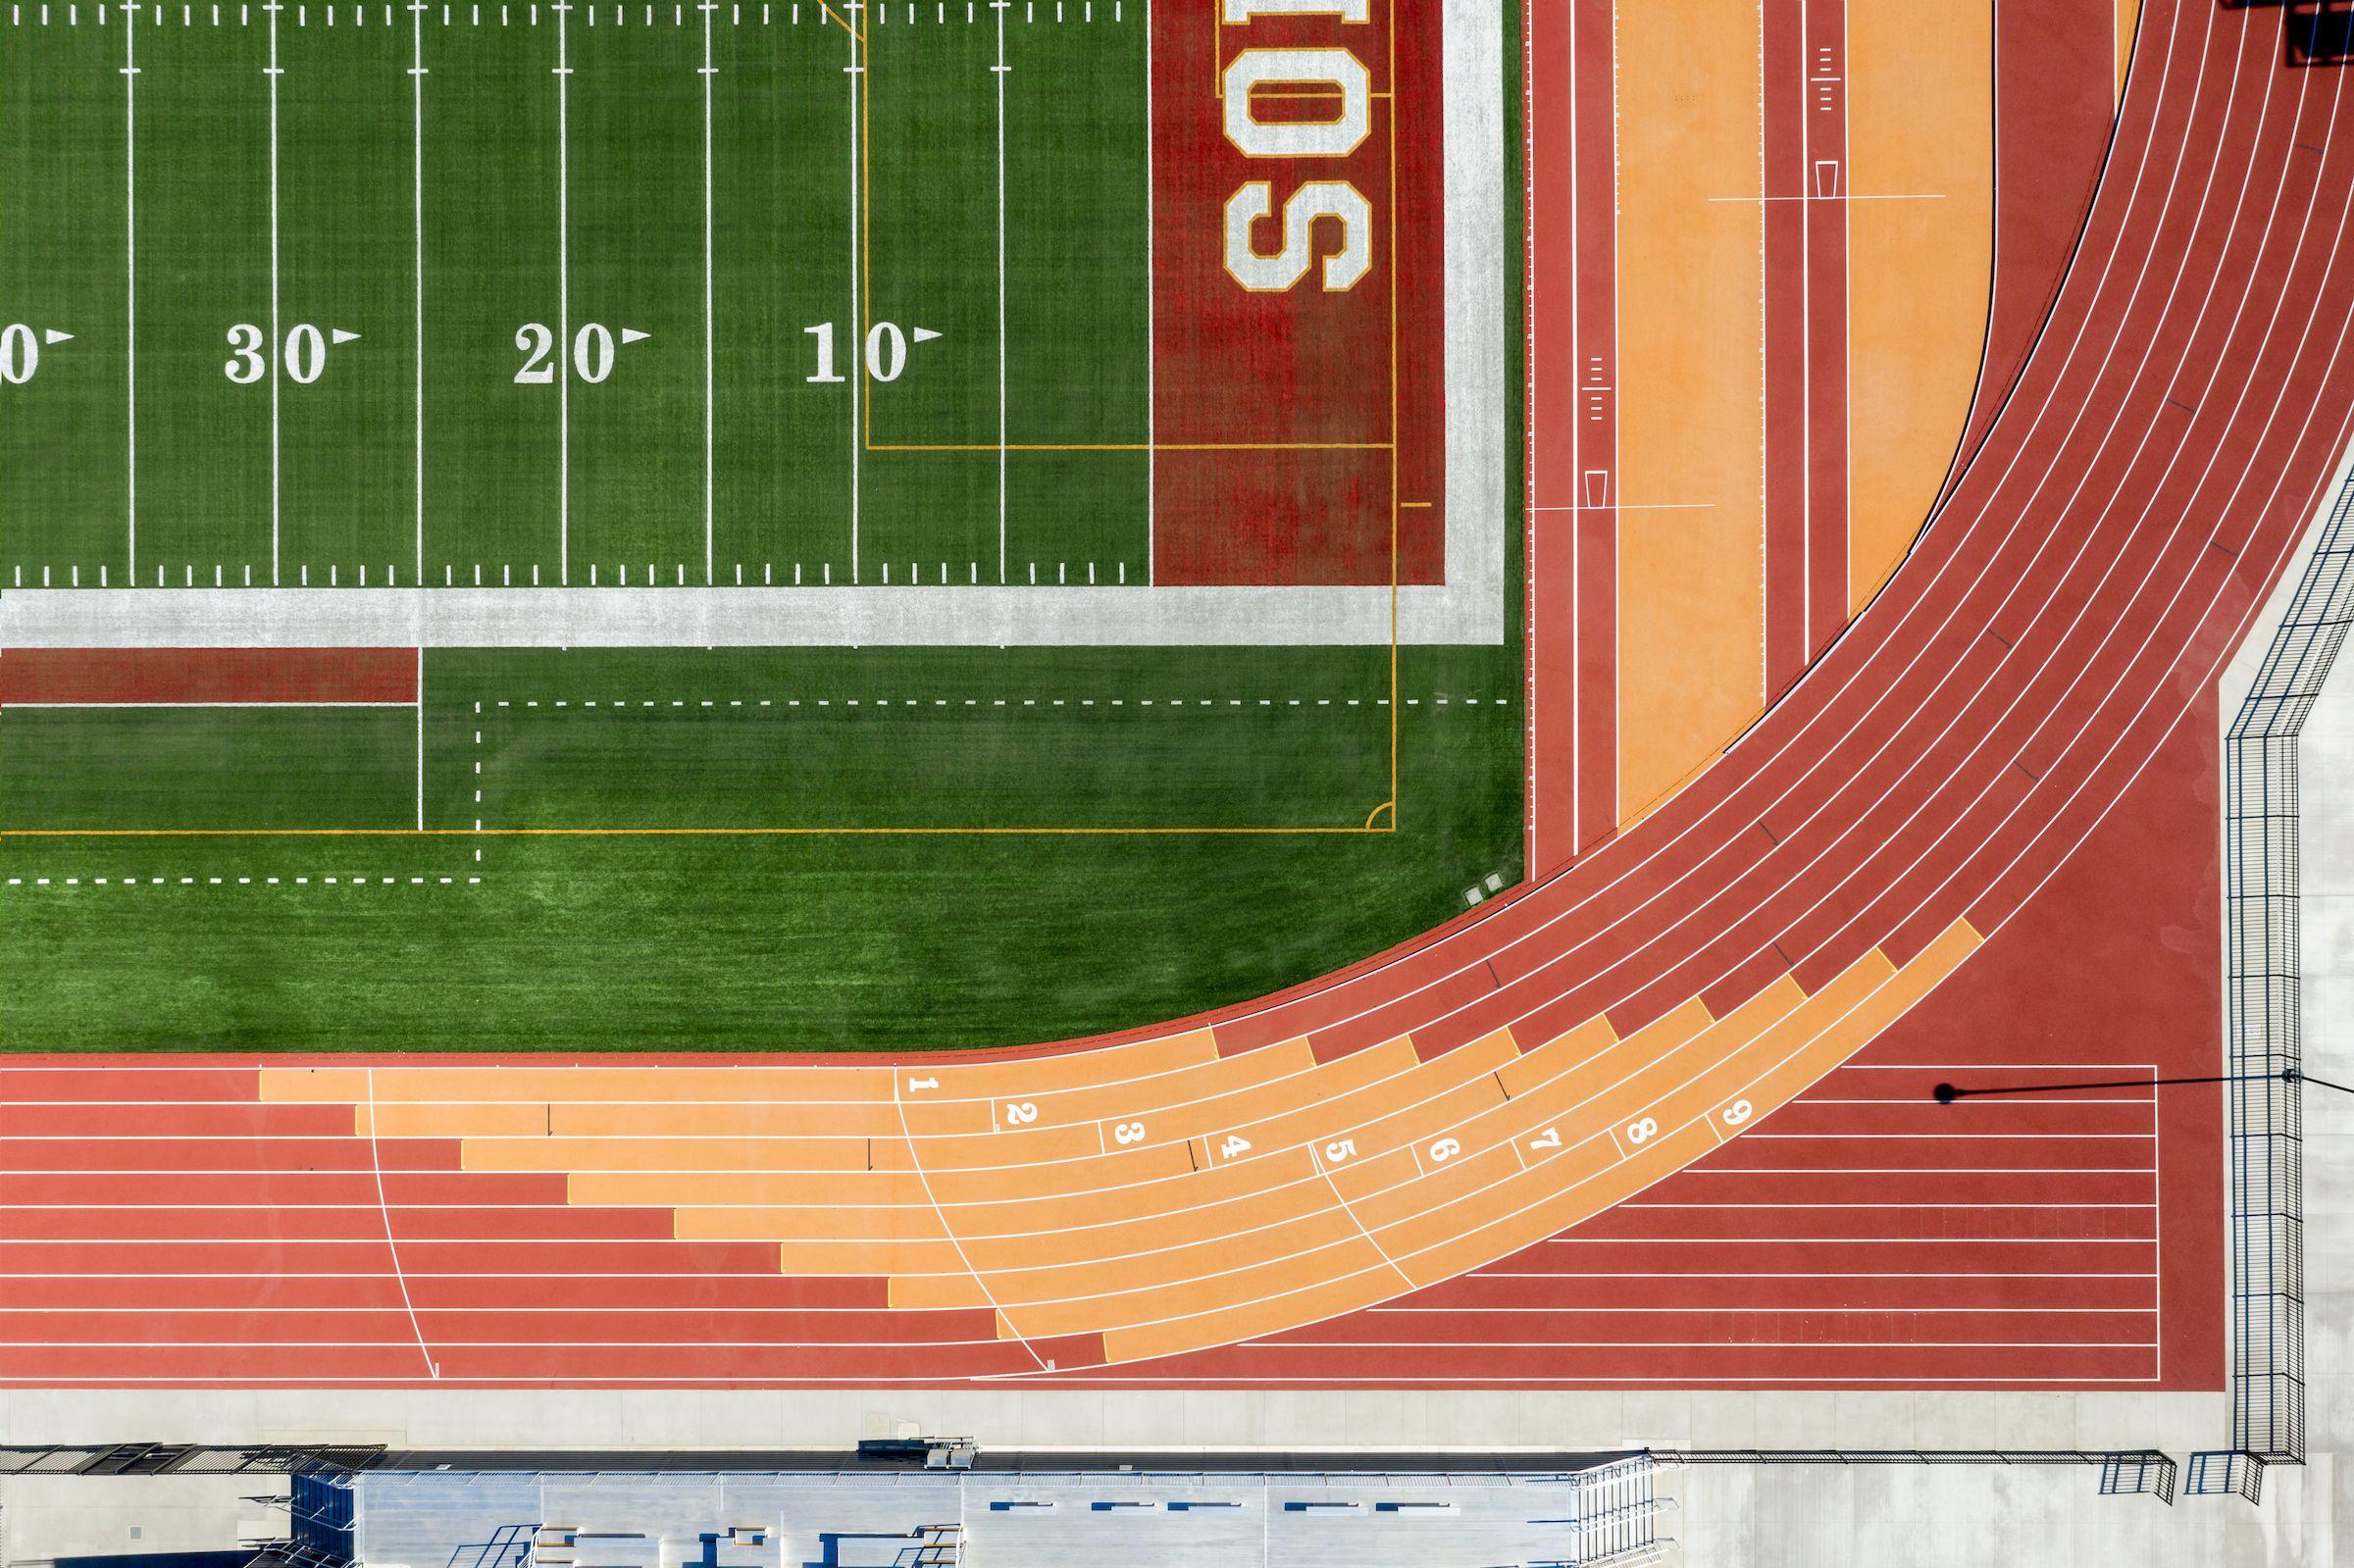 Saddleback Athletic Complex